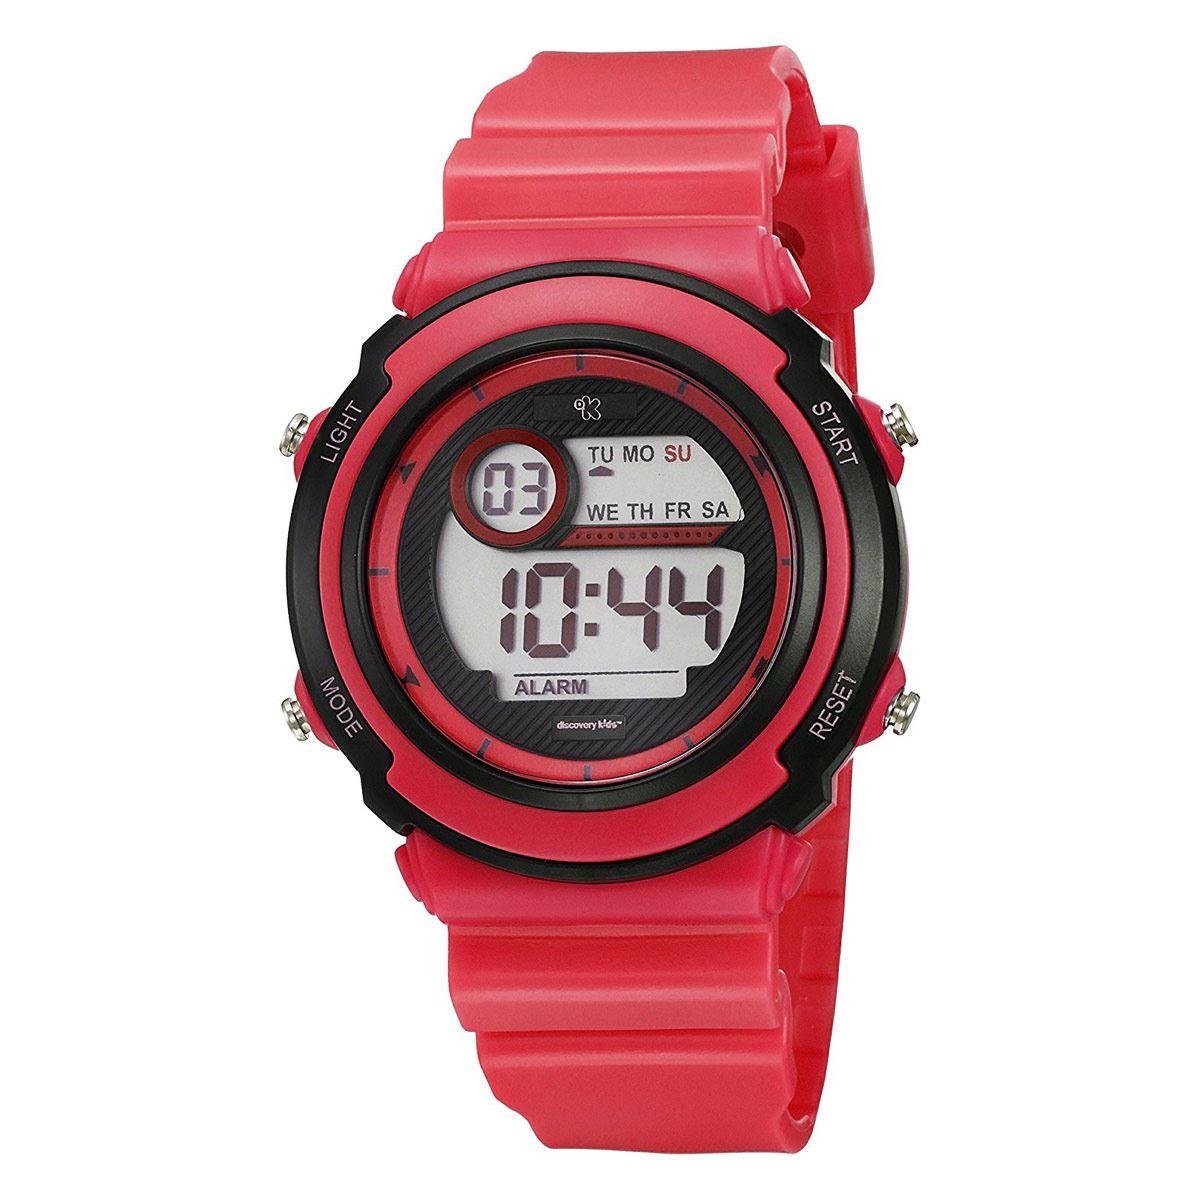 Reloj Discovery Kids Infantil DKID 81016 F Red